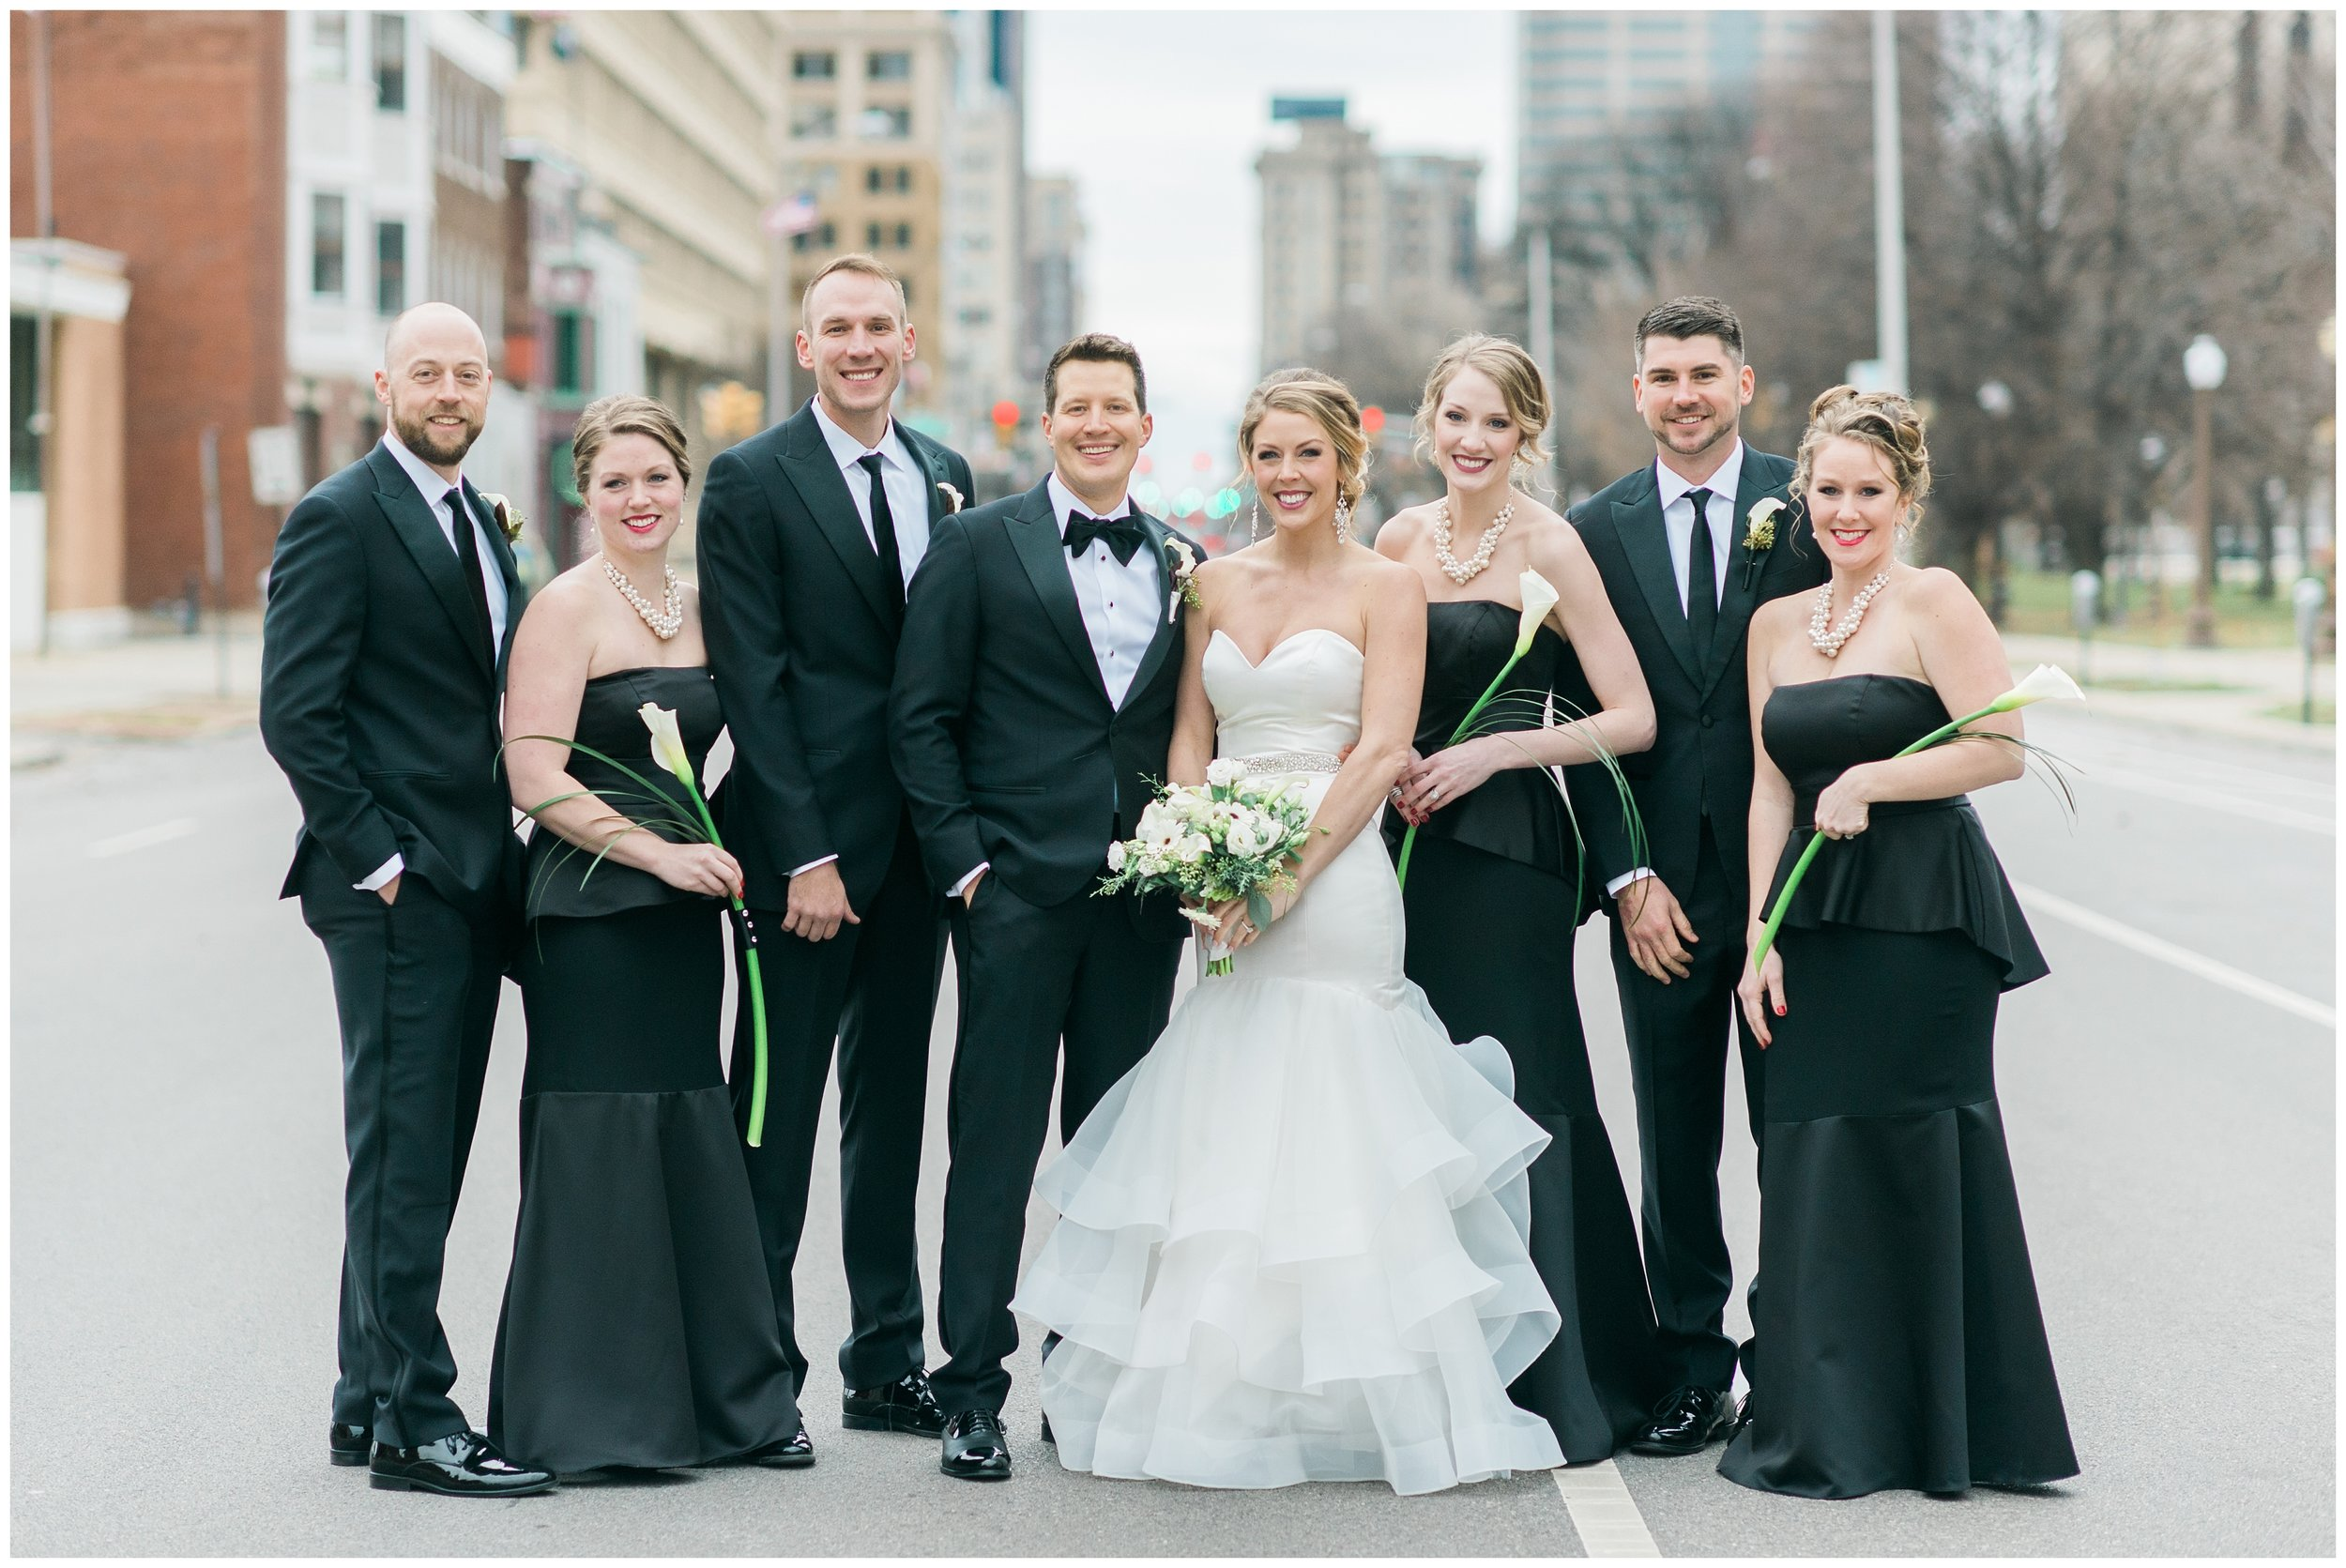 Rebecca_Bridges_Photography_Indianapolis_Wedding_Photographer_5818.jpg